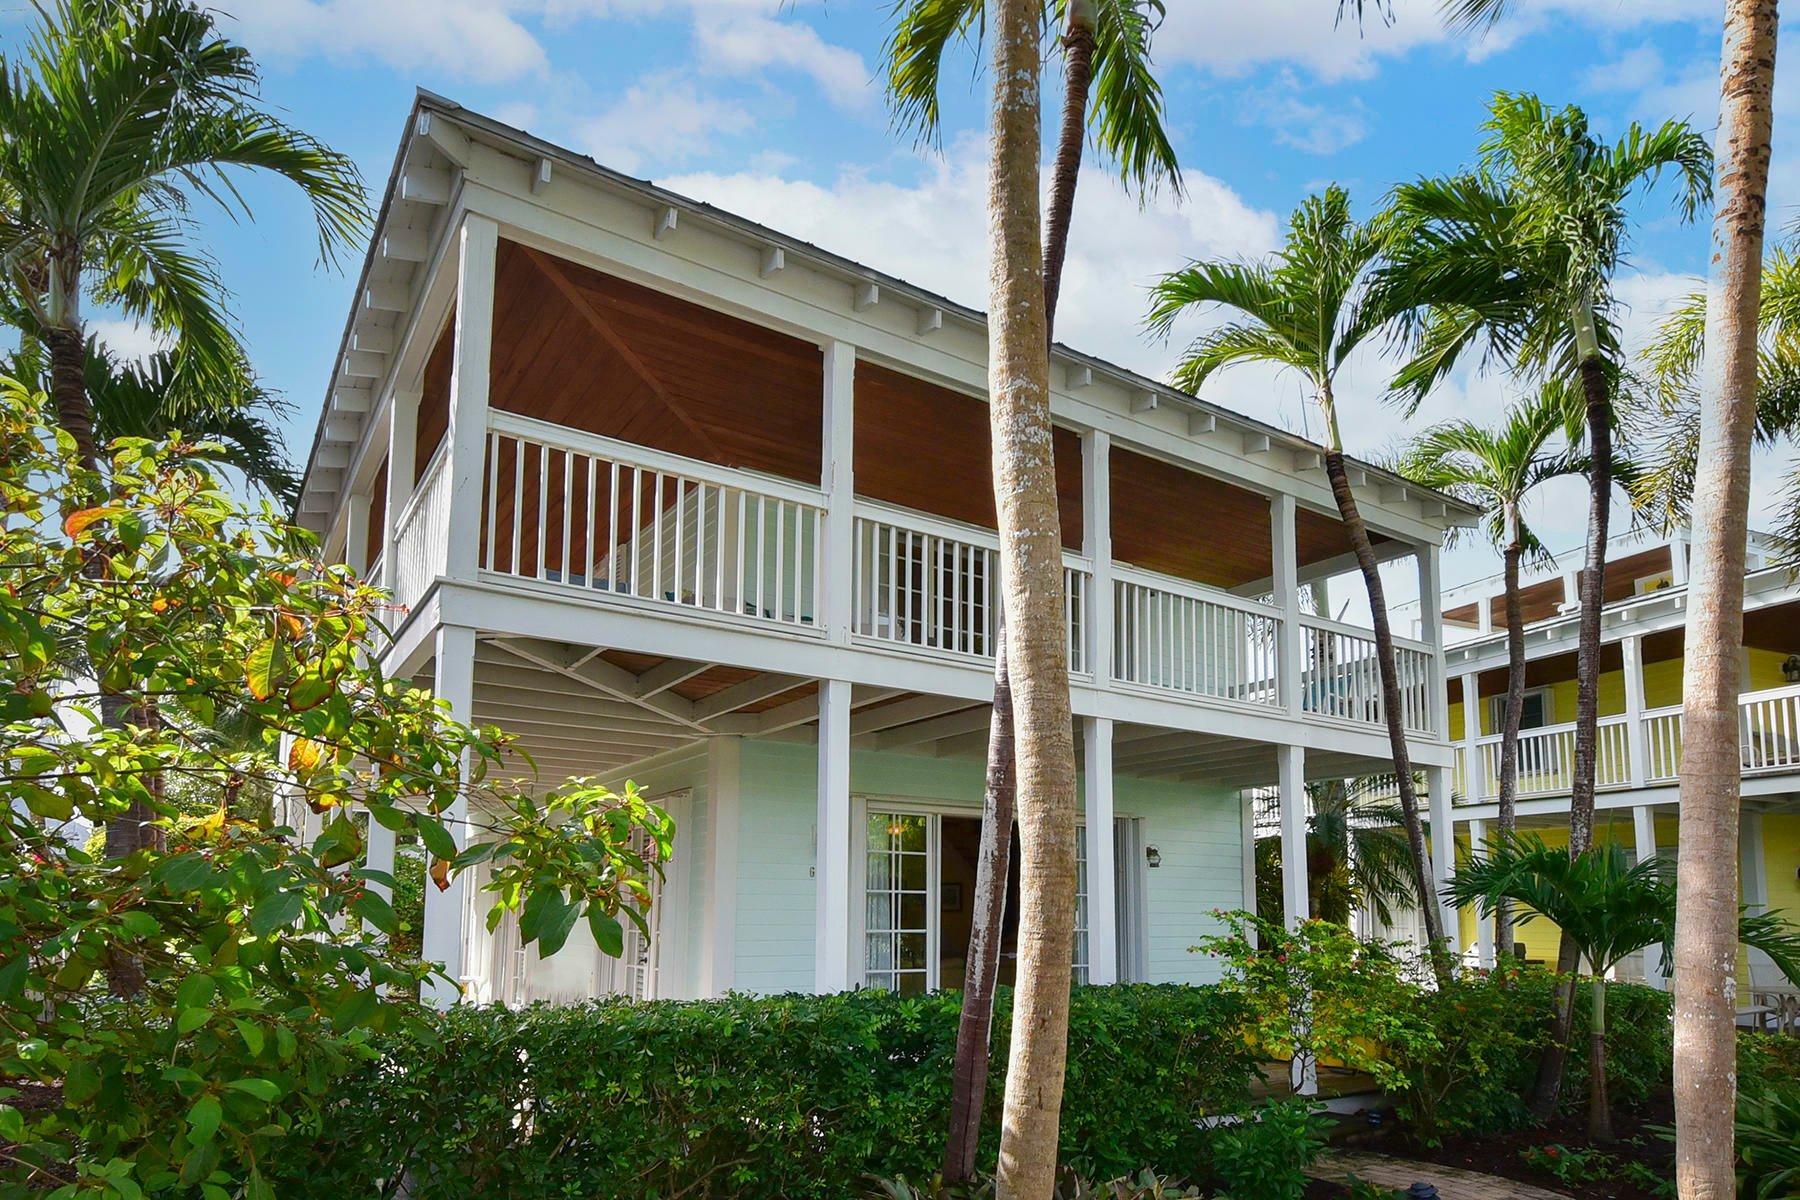 House in Key West, Florida, United States 1